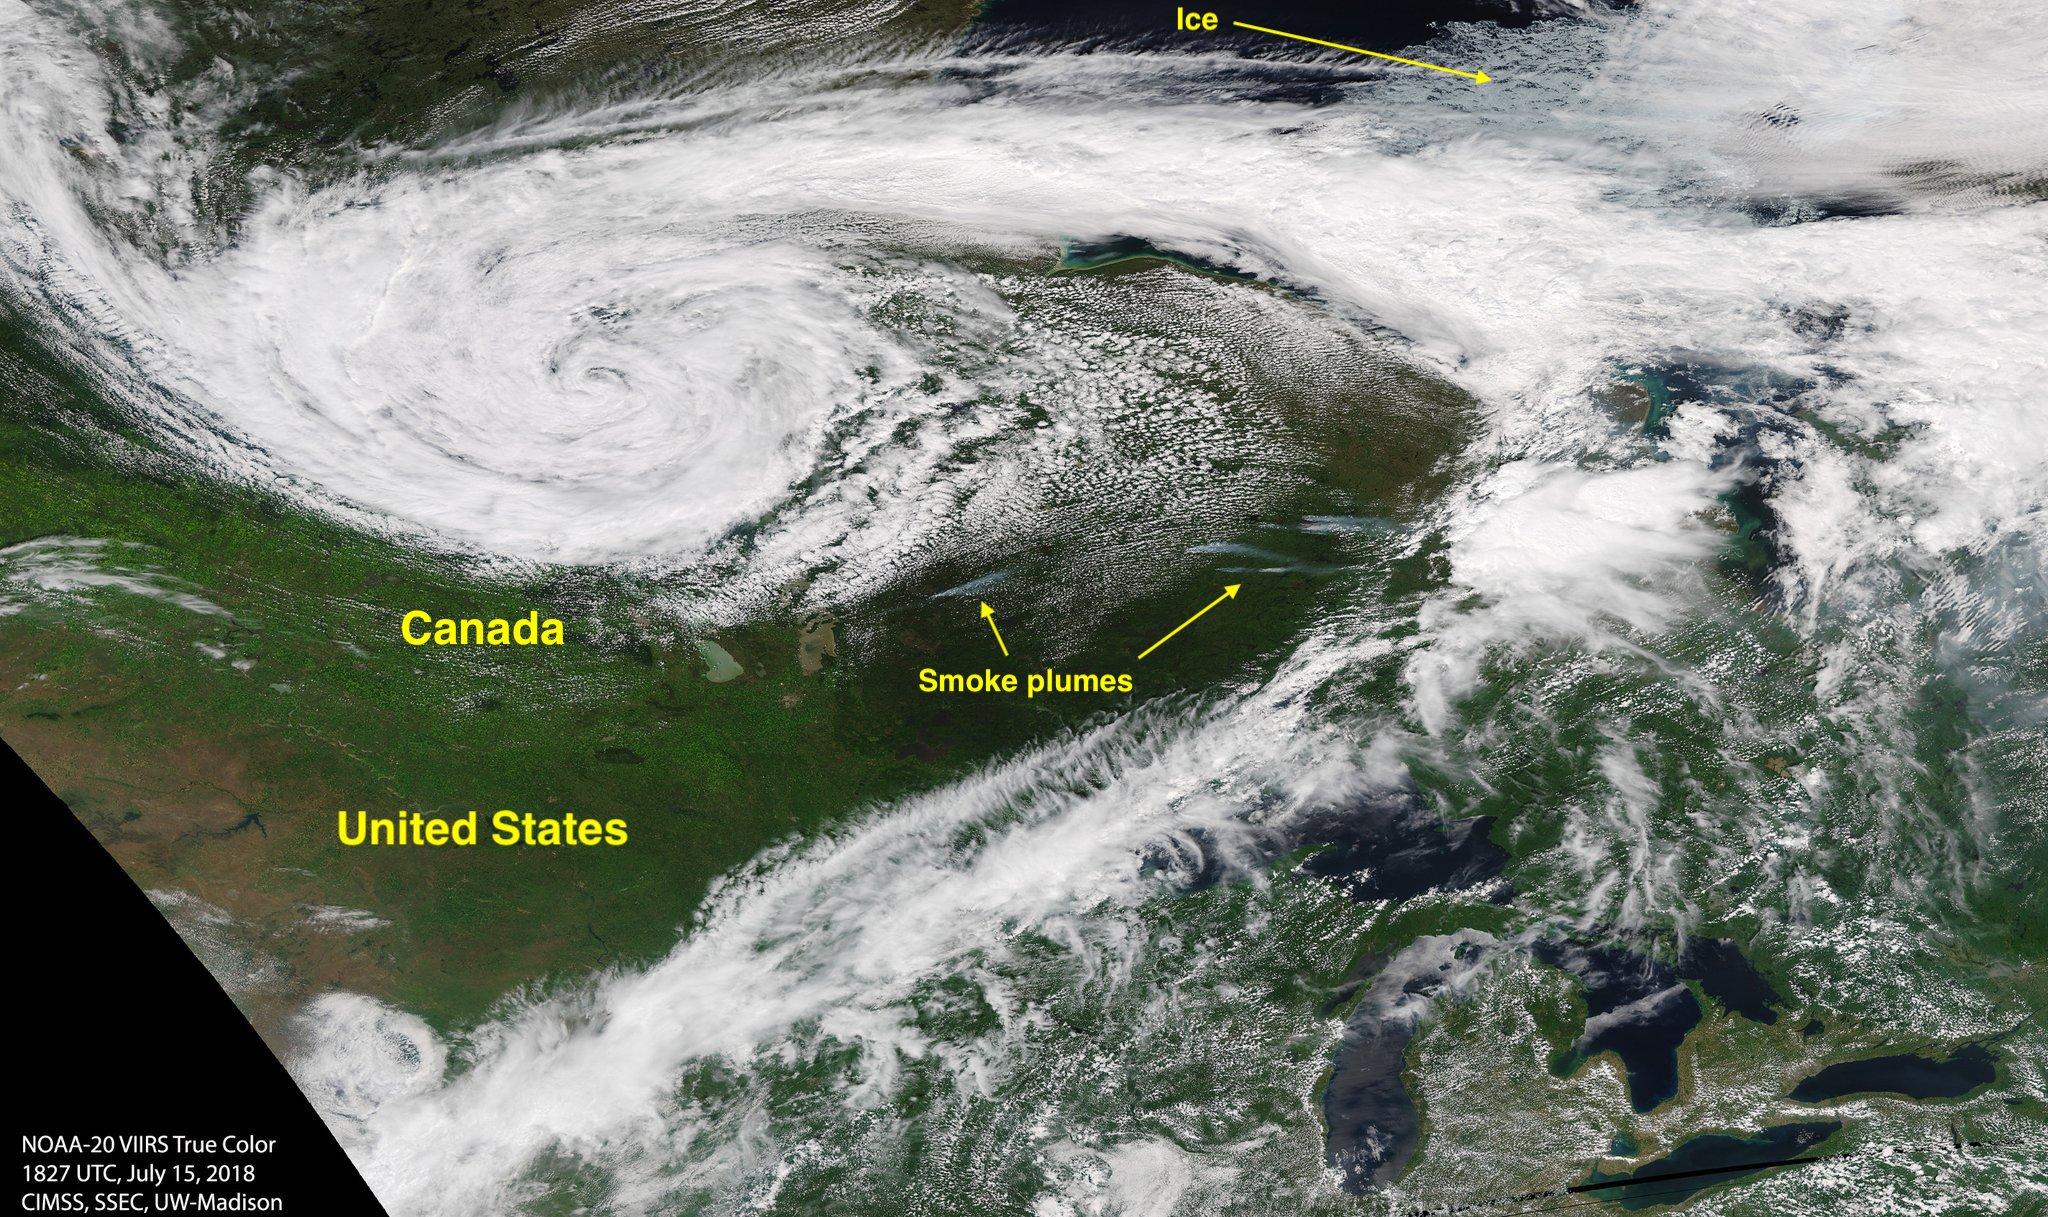 NOAA-20 VIIRS True Color RGB image [click to enlarge]